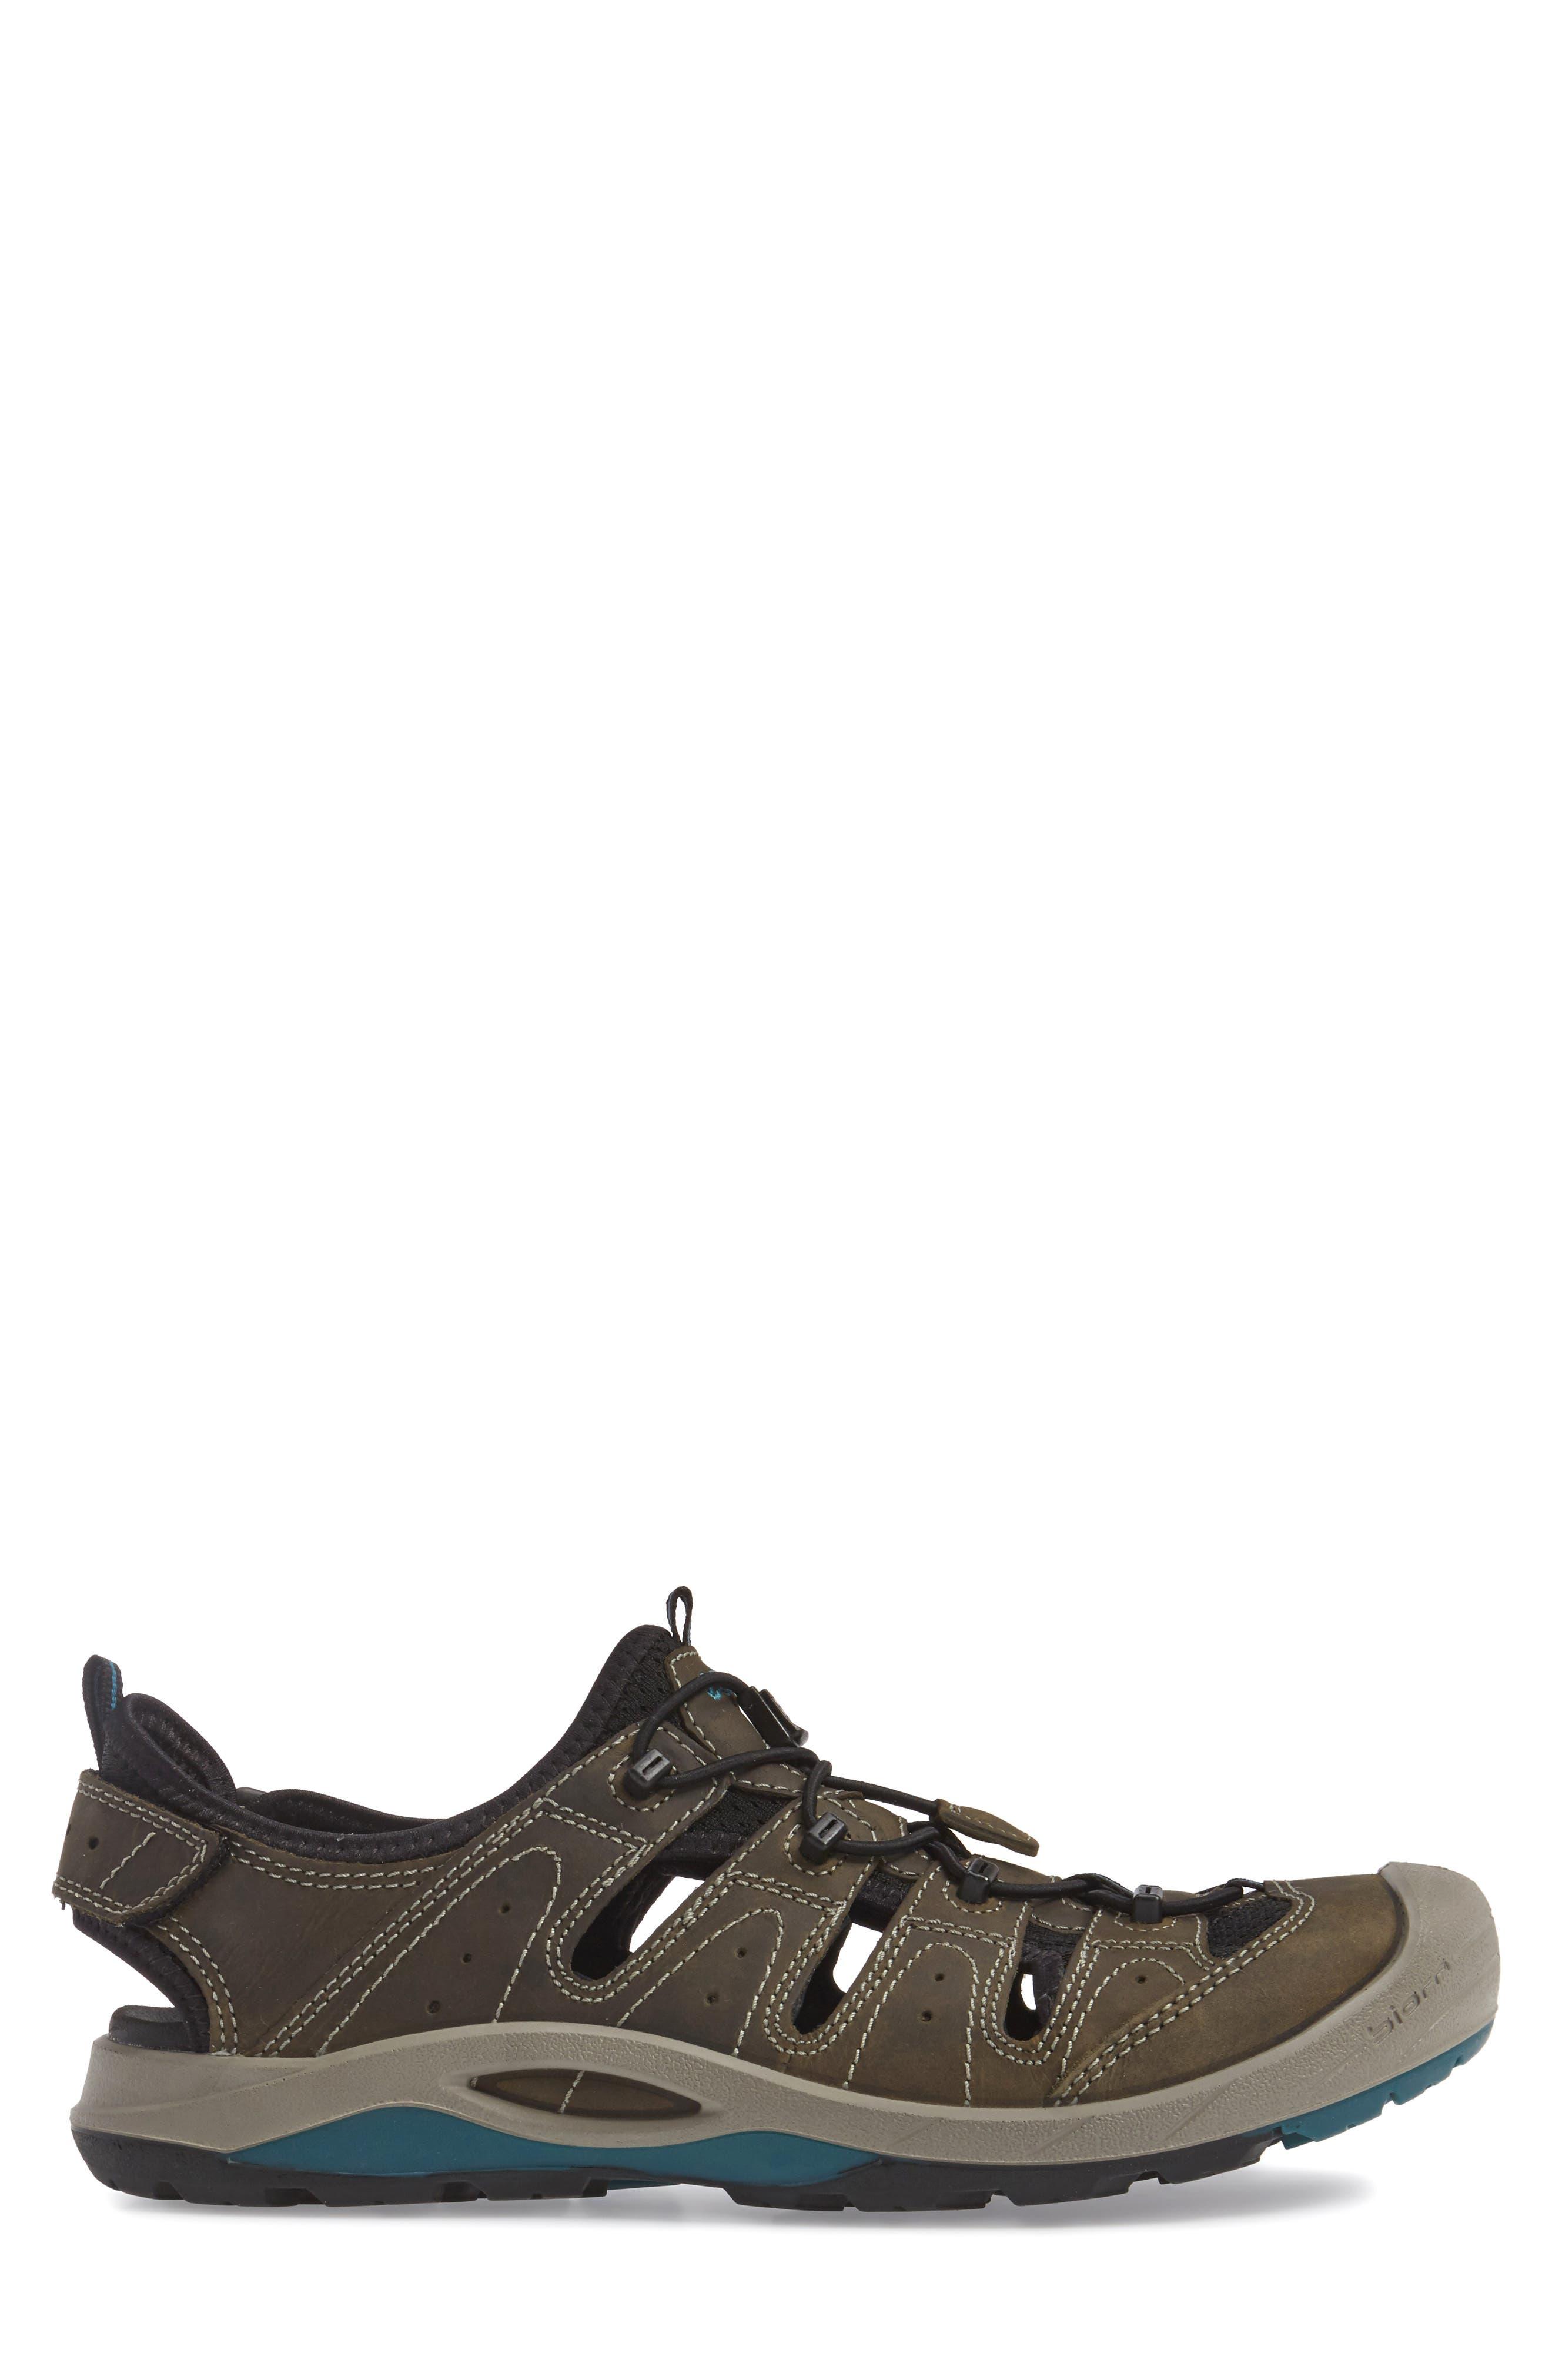 'BIOM Delta Offroad' Sandal,                             Alternate thumbnail 3, color,                             Tarmac/ Black